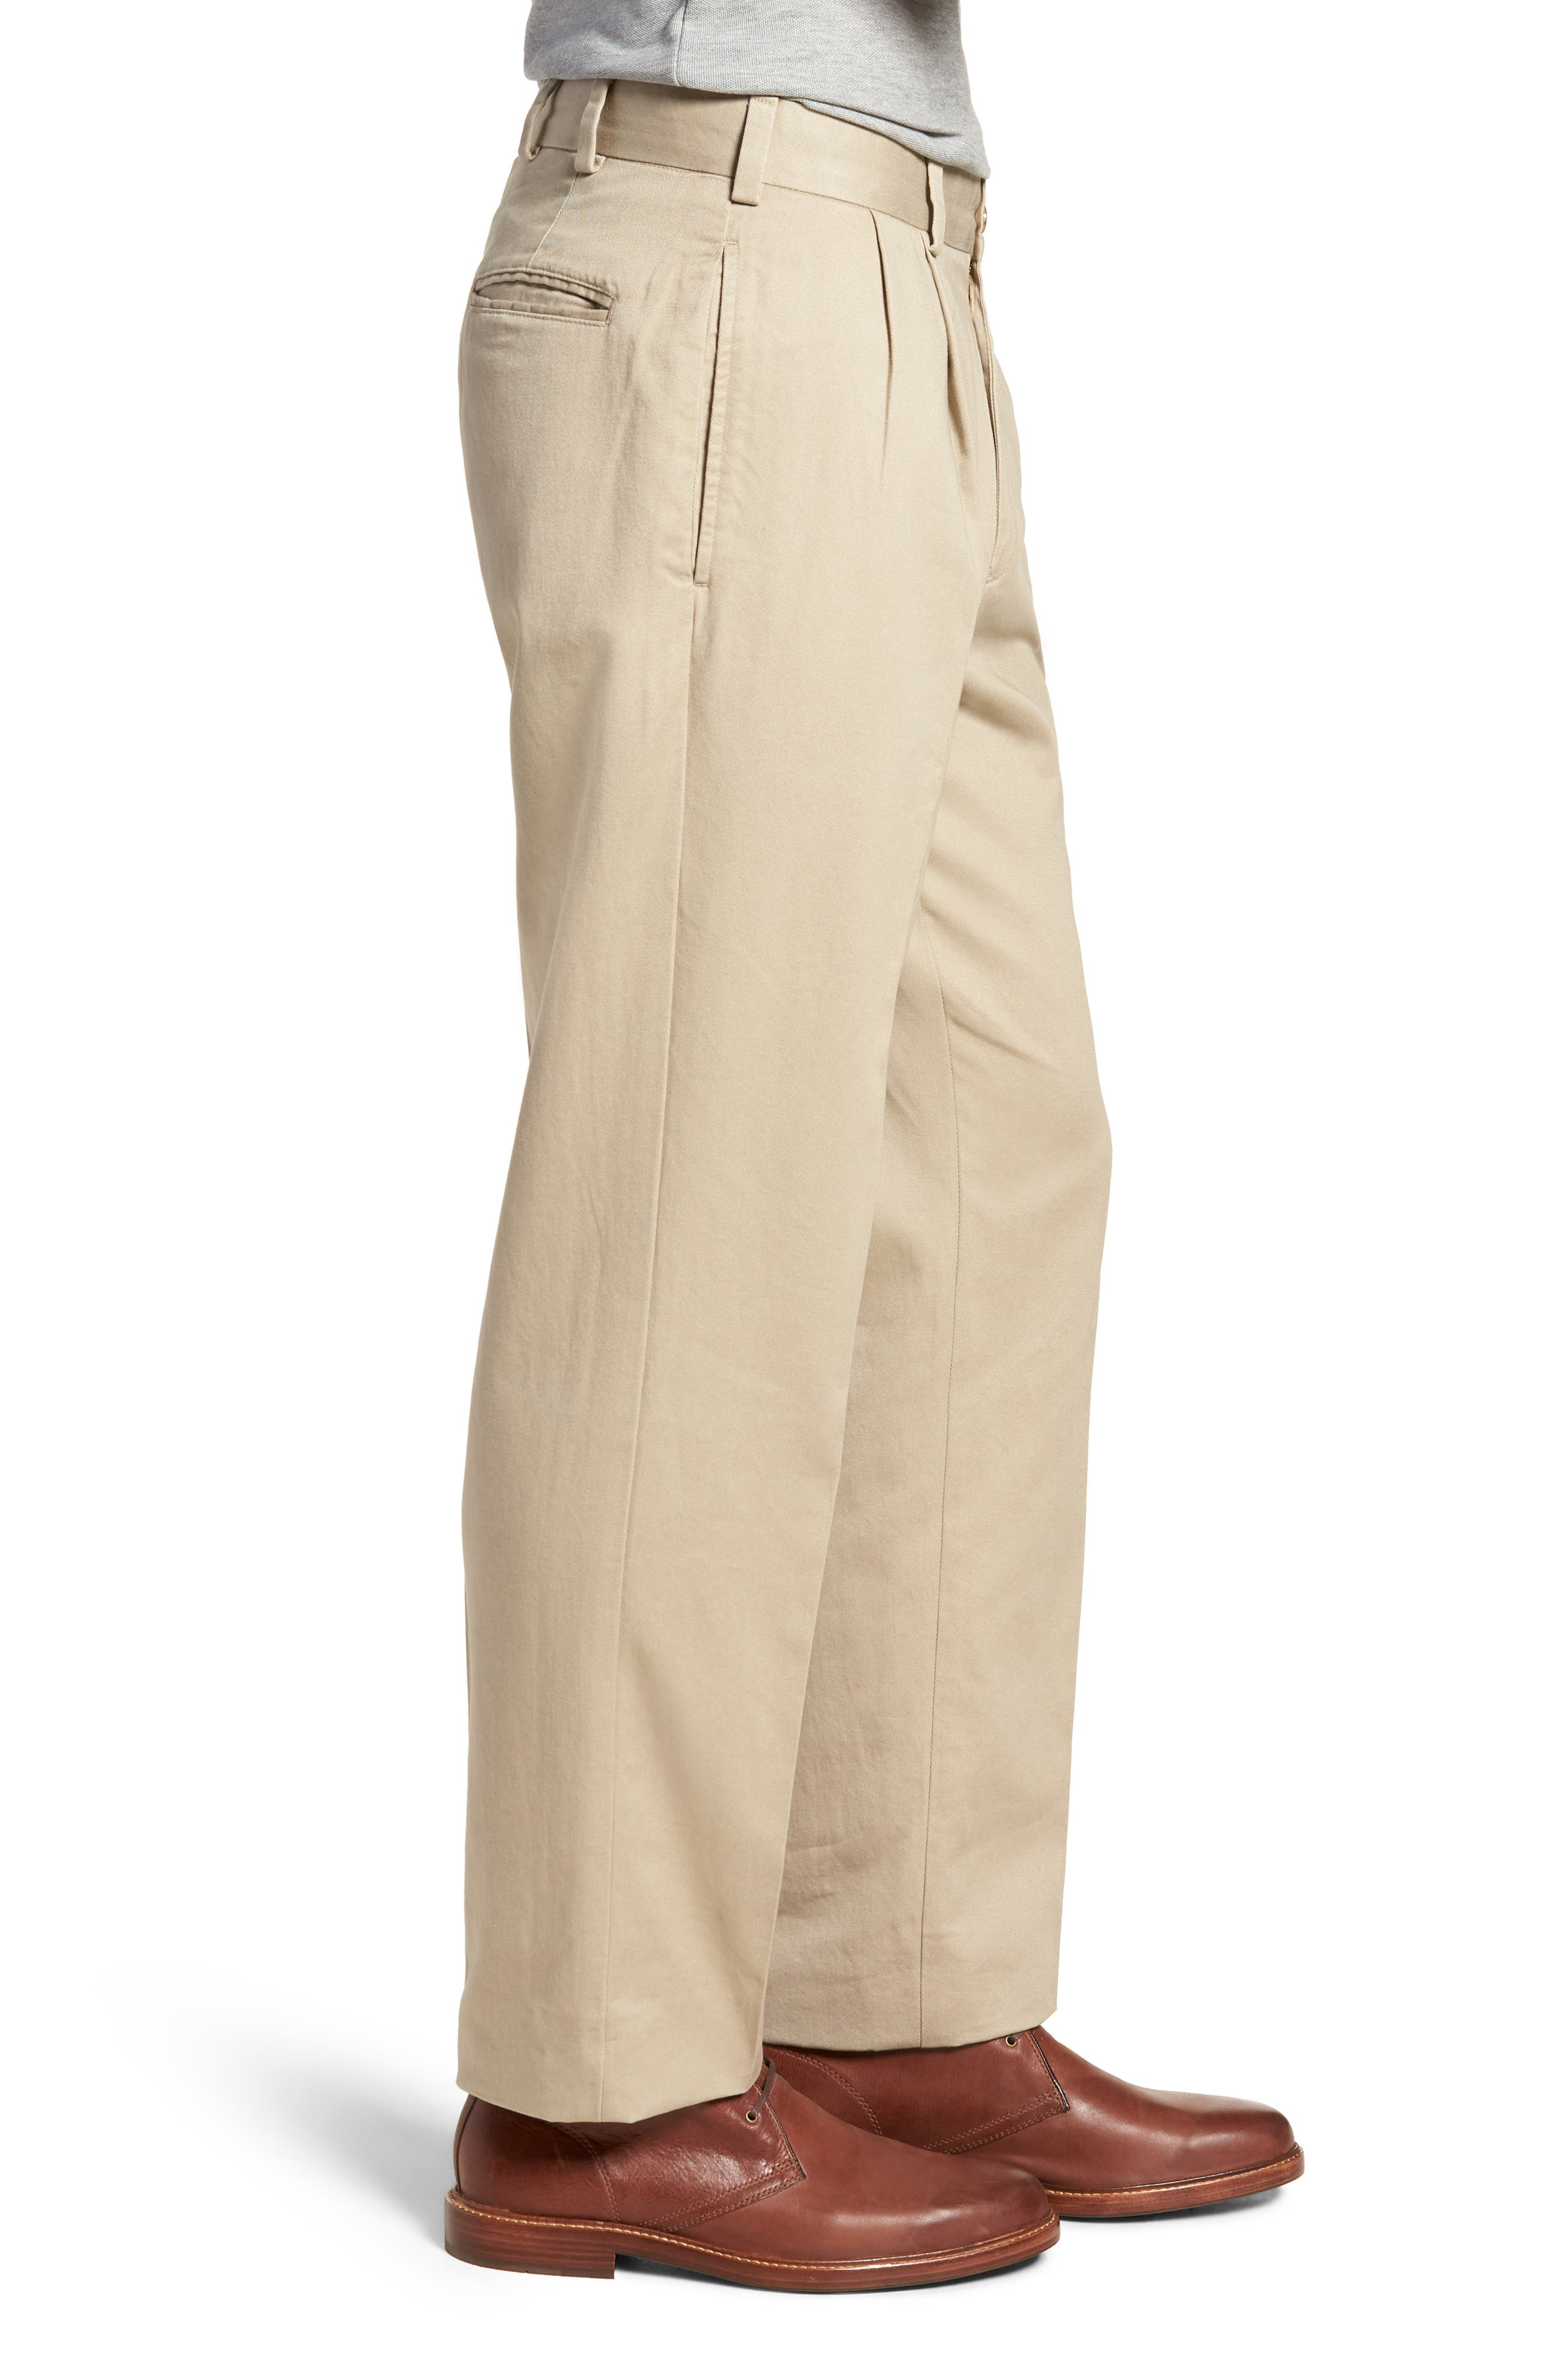 M2 Classic Fit Pleated Vintage Twill Pants,                             Alternate thumbnail 3, color,                             Khaki